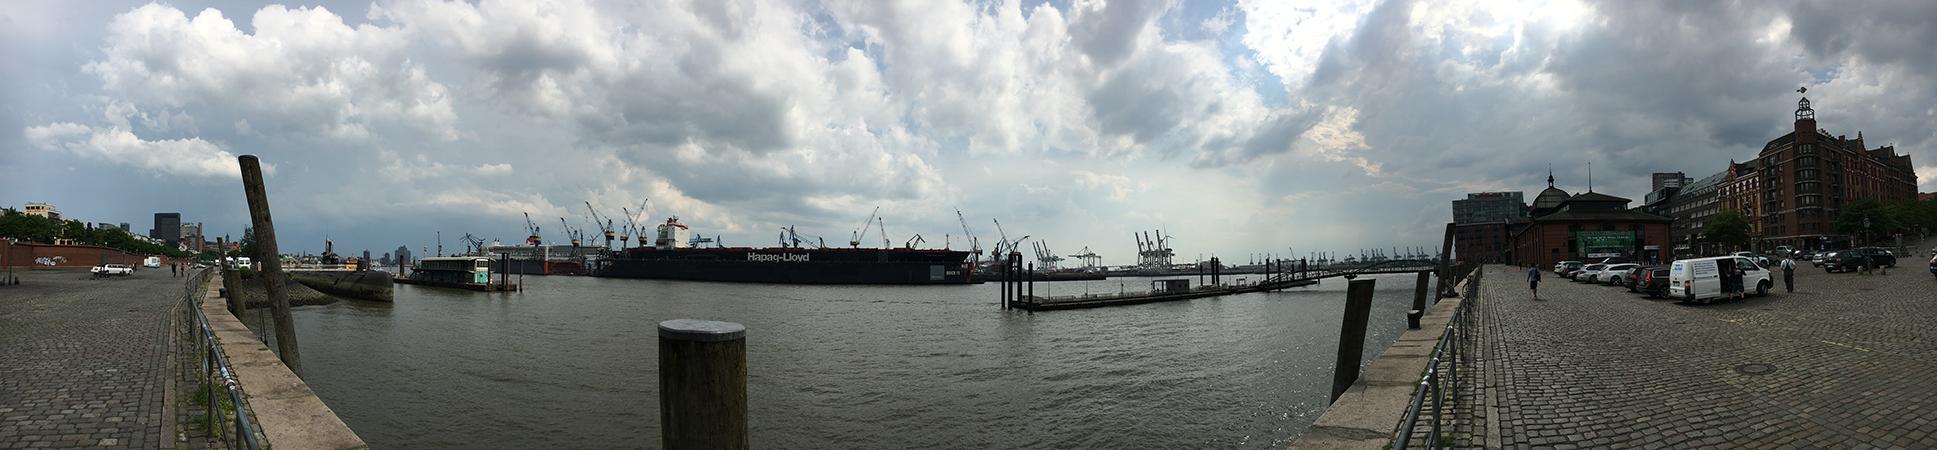 Hafengeschichten Hamburg Panorama Hafen